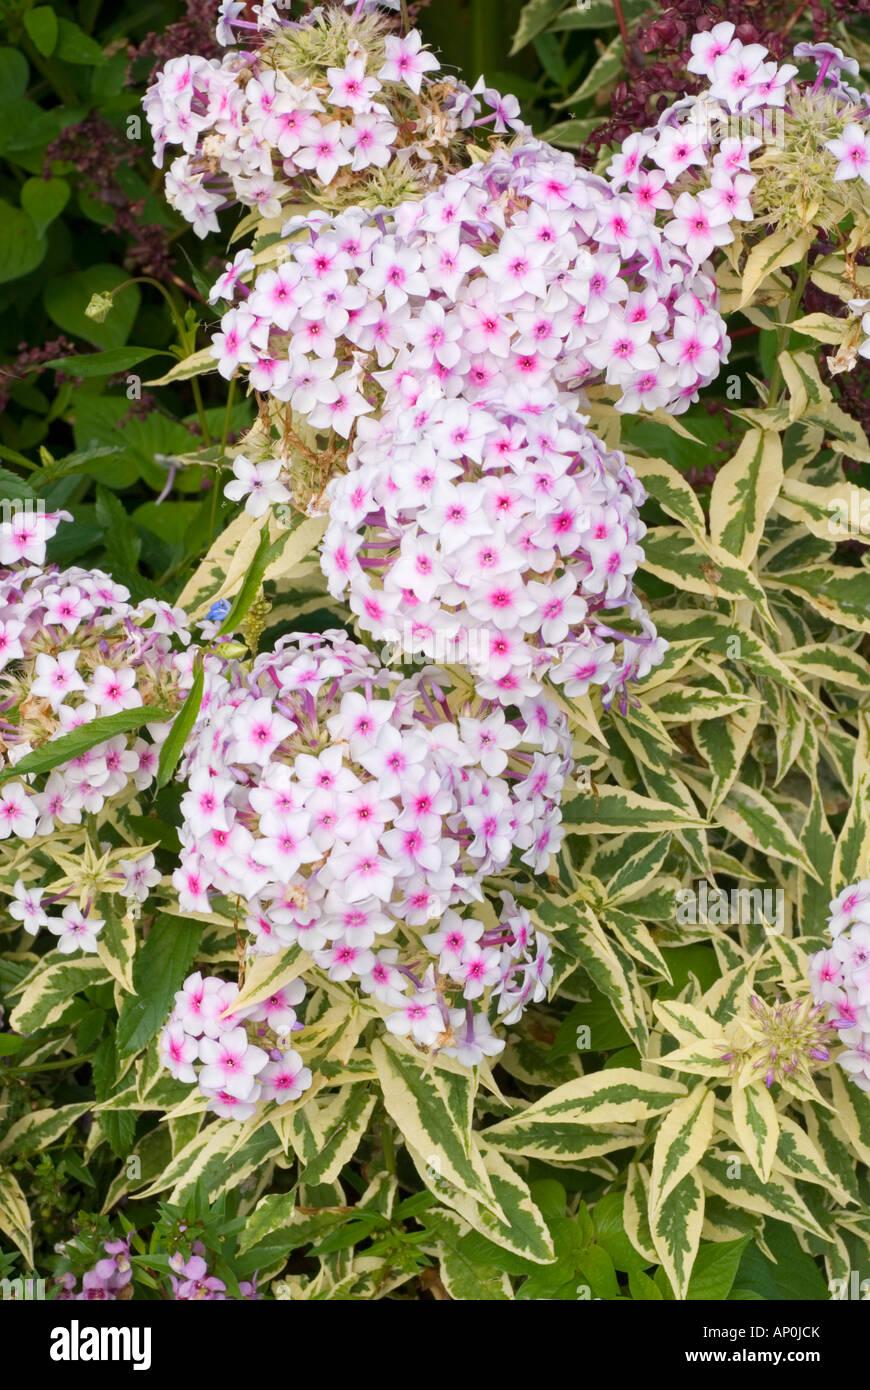 Phlox paniculata norah leigh variegated foliage garden perennial phlox paniculata norah leigh variegated foliage garden perennial in bloom fragrant flowers mightylinksfo